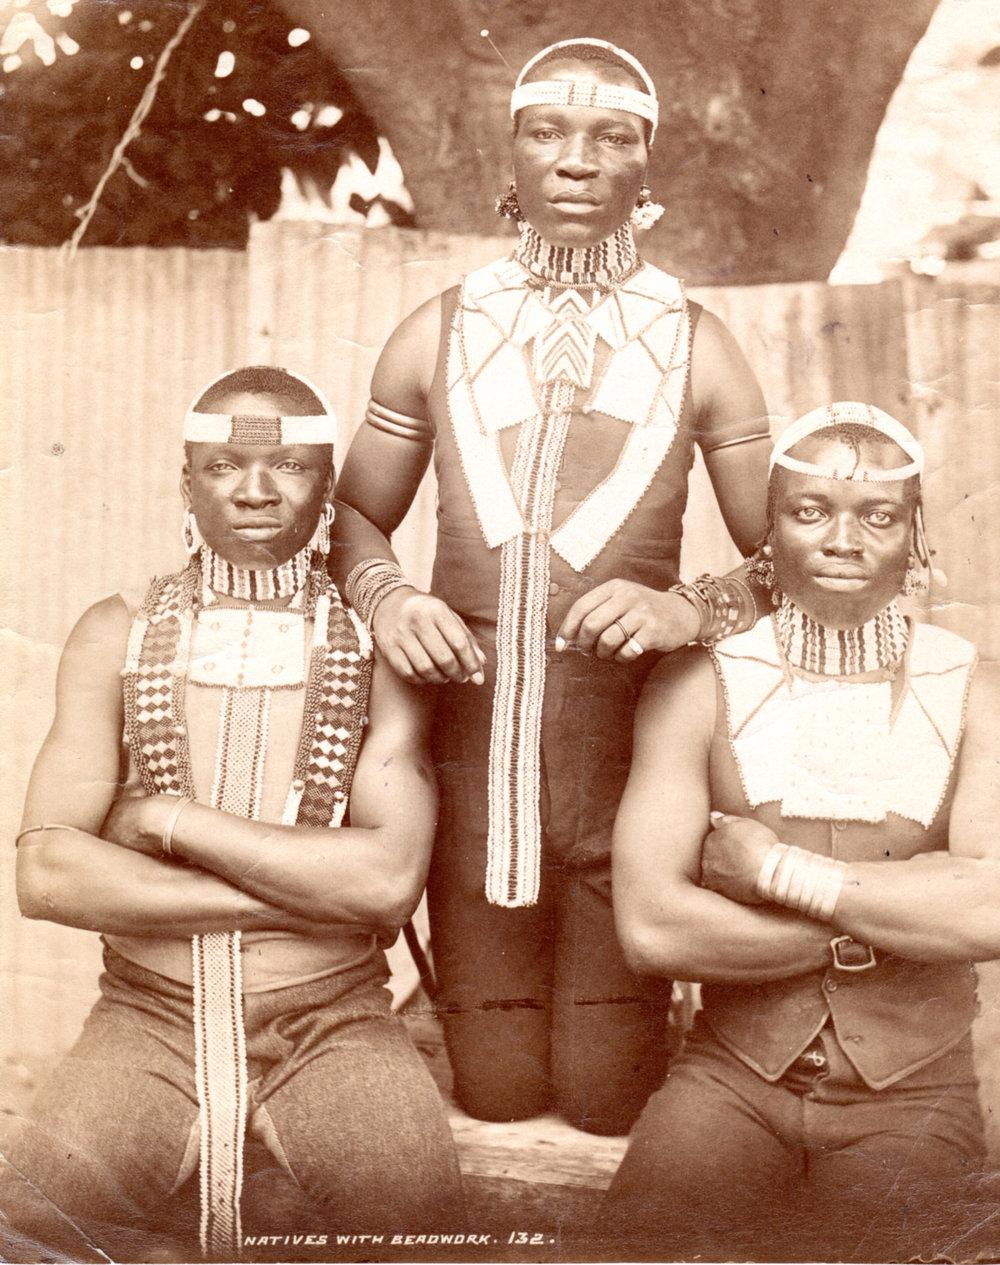 Various native peoples